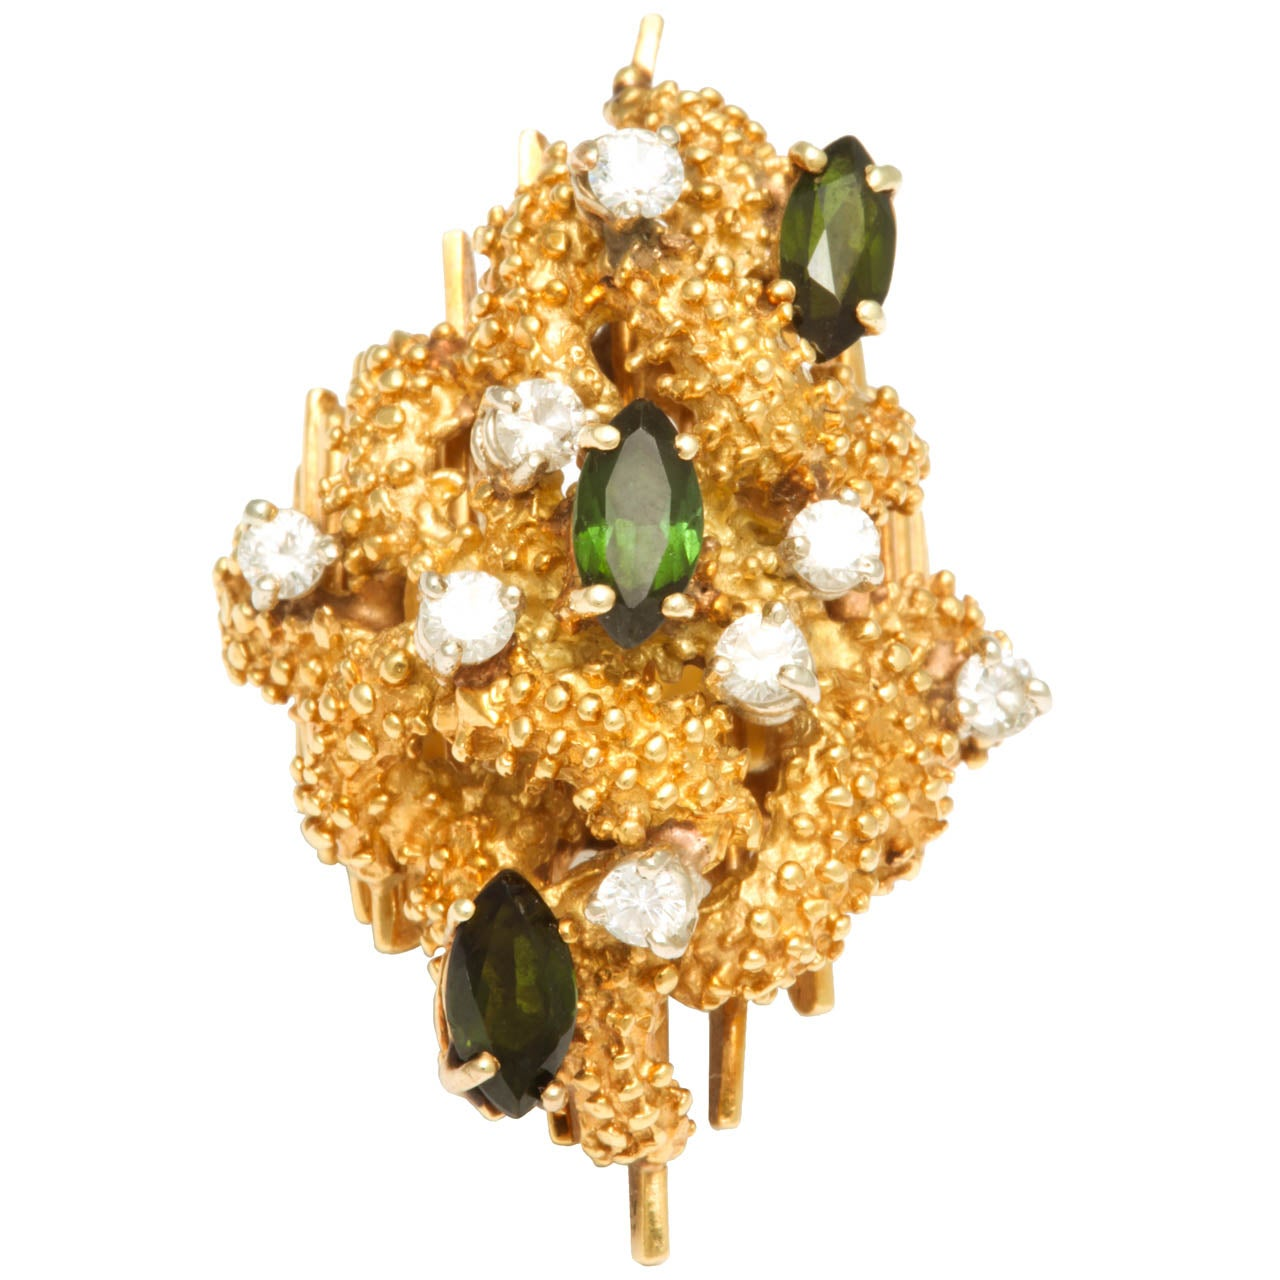 Oversized Architectural Tourmaline Diamond Gold Ring